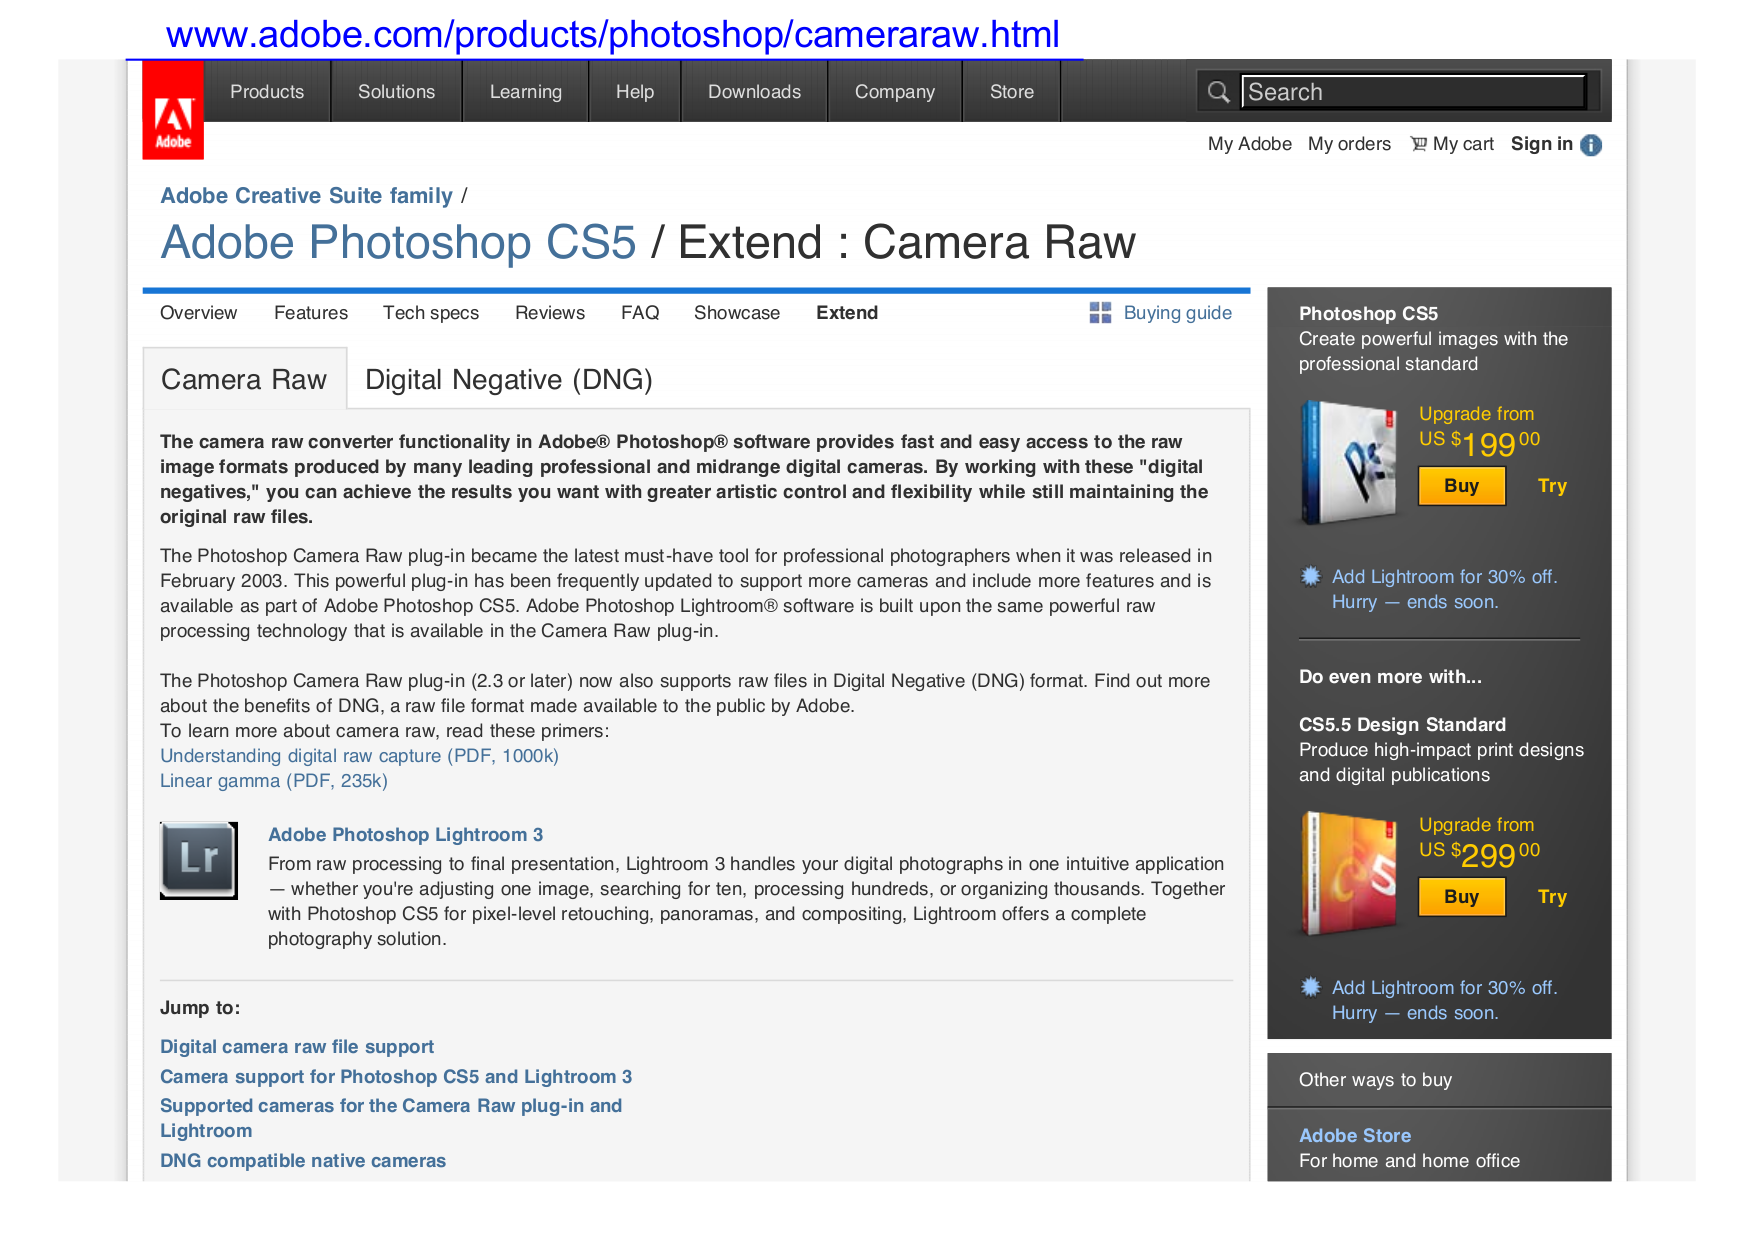 Adobe photoshop cs5 tutorial pdf choice image any tutorial examples adobe photoshop cs5 full tutorial pdf gallery any tutorial examples download free pdf for kodak easyshare baditri Choice Image